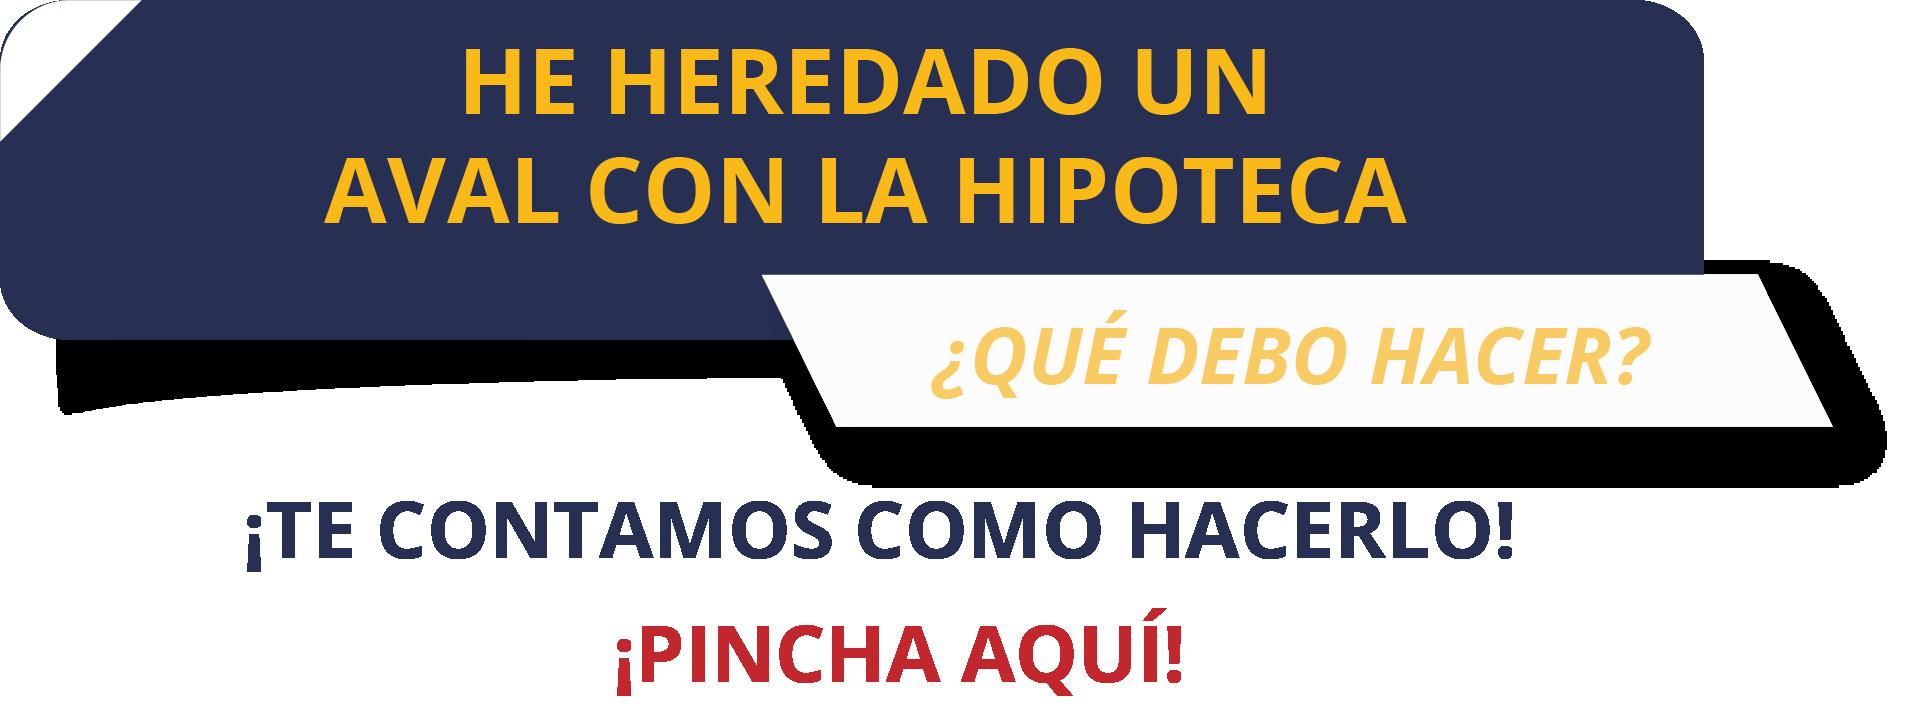 AVAL HIPOTECA HERENCIA